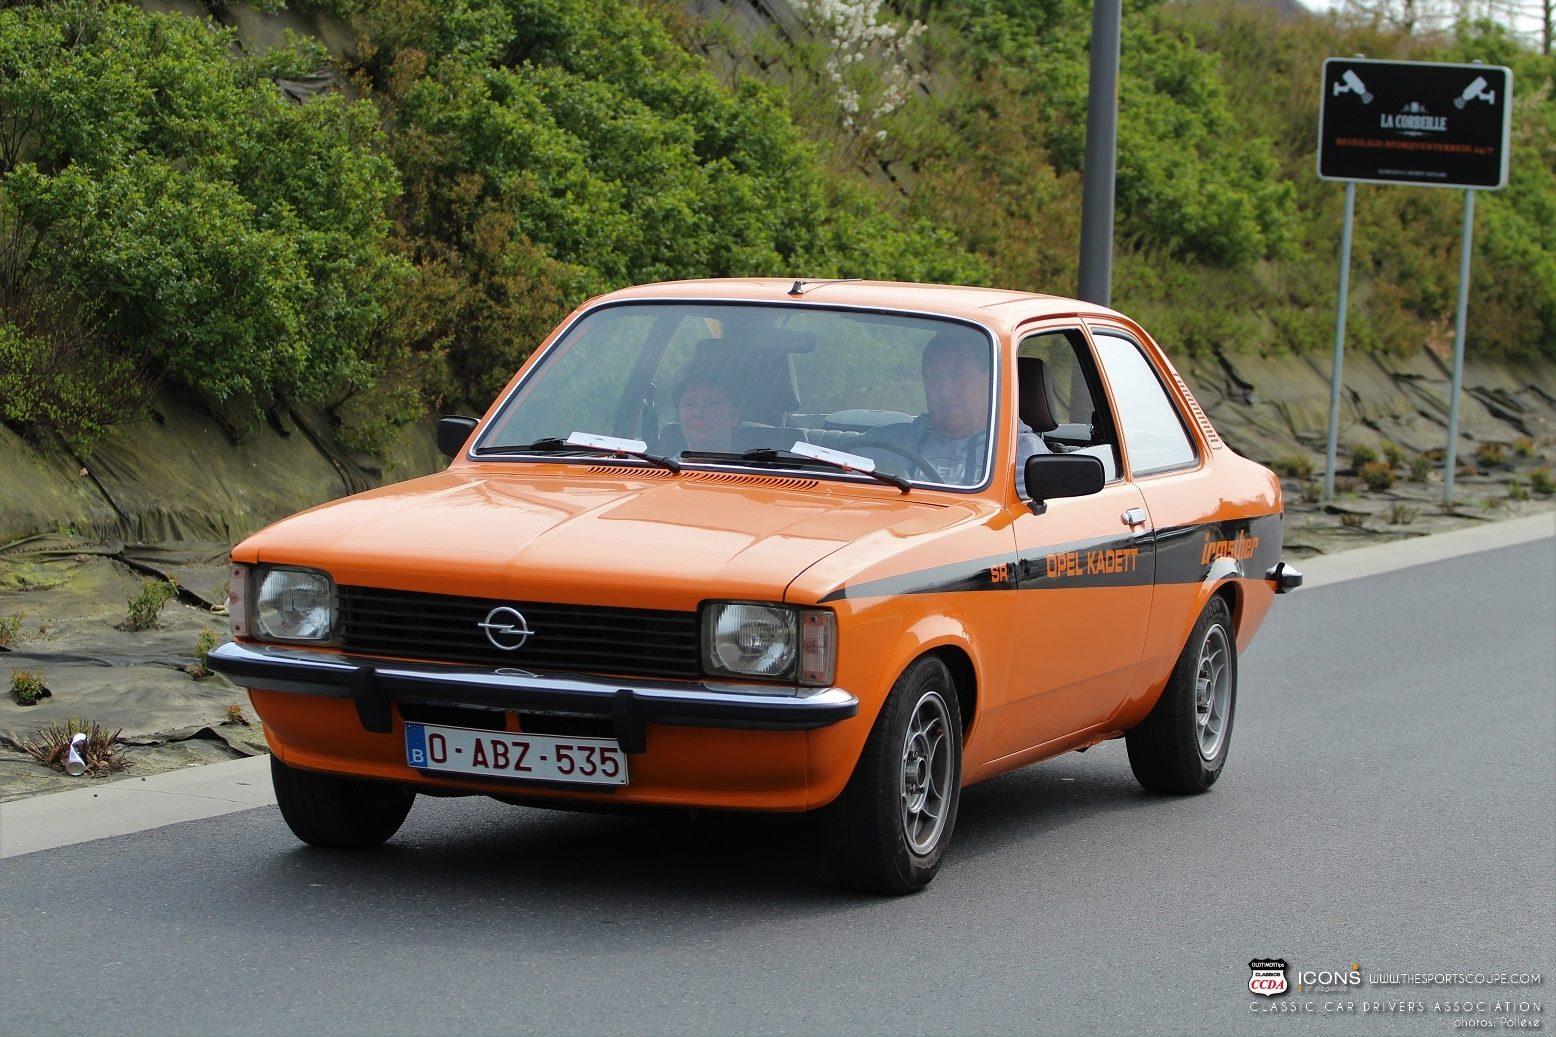 Opel-mix--7-4-2019--9